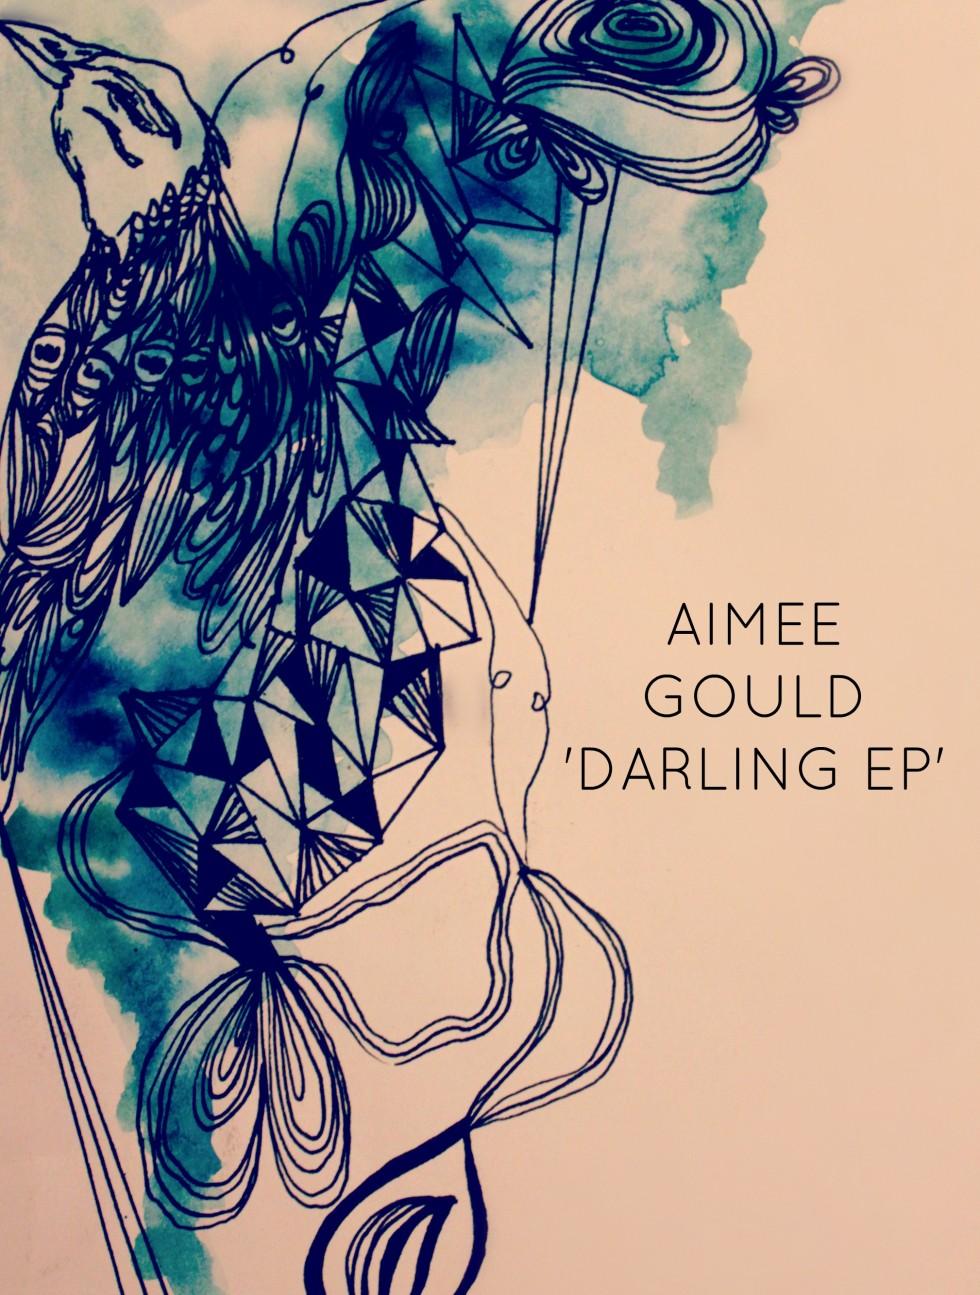 Aimee Gould - EP Cover